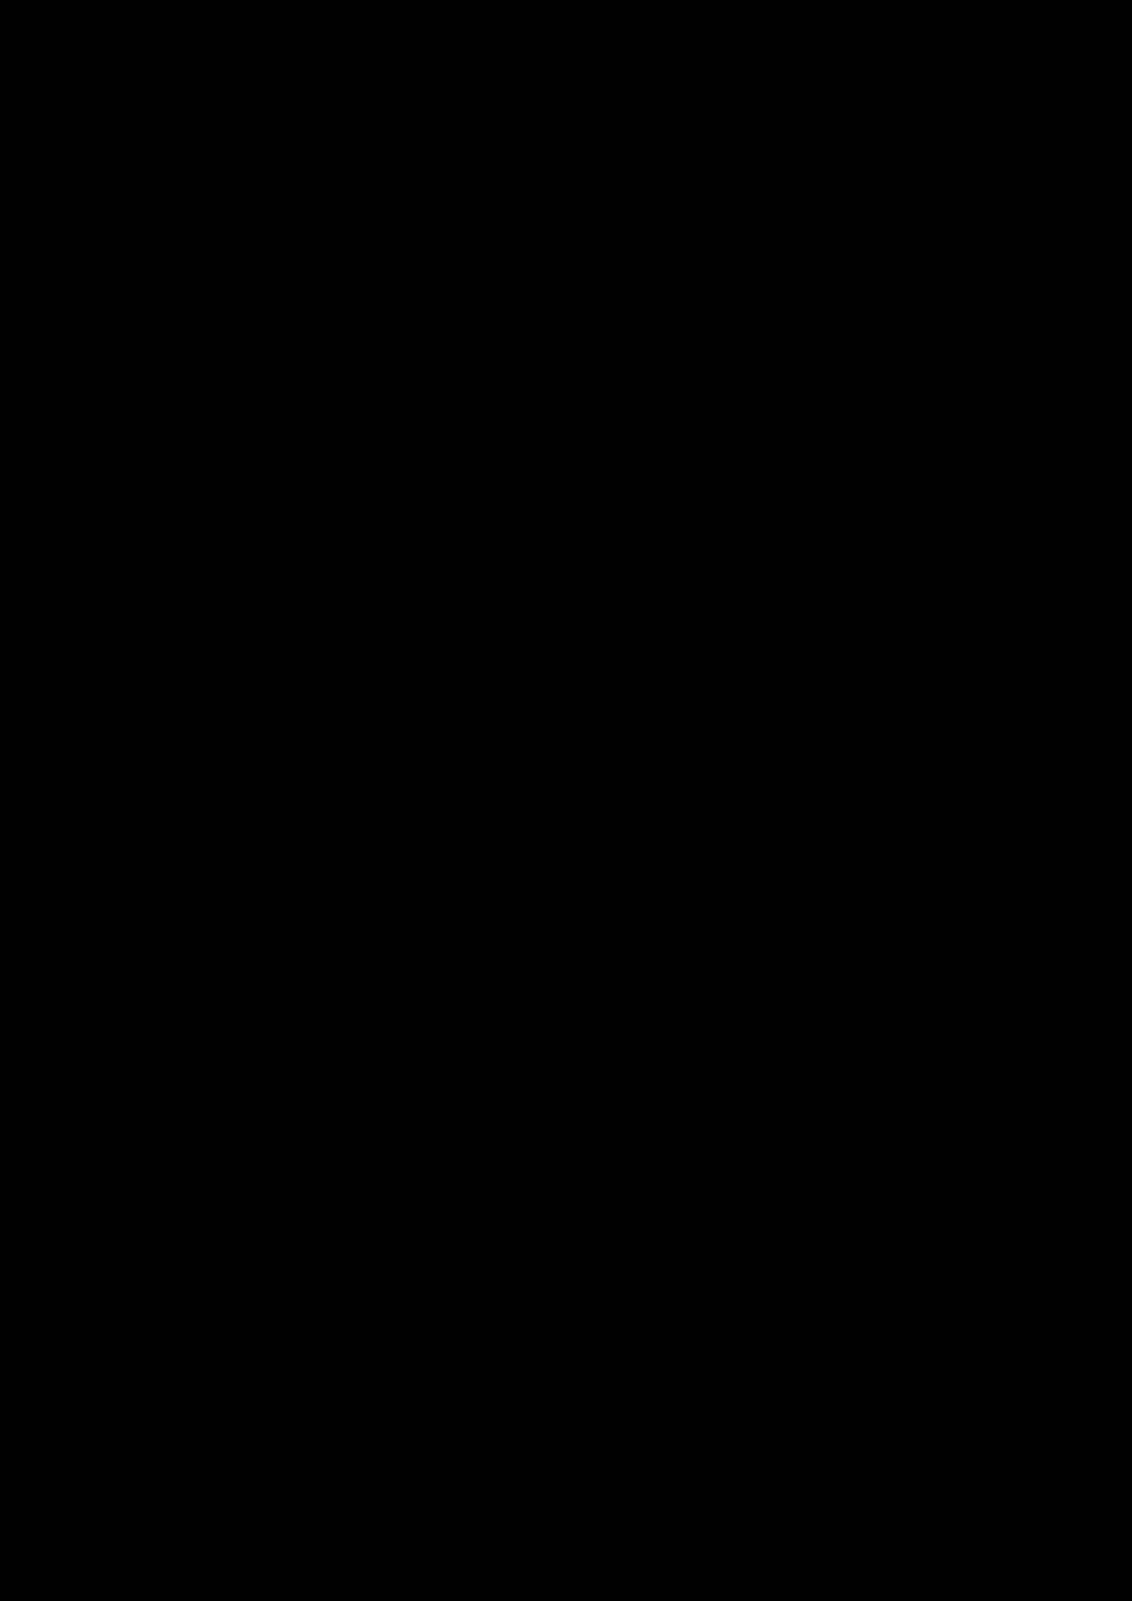 Ispoved Pervogo Boga slide, Image 43